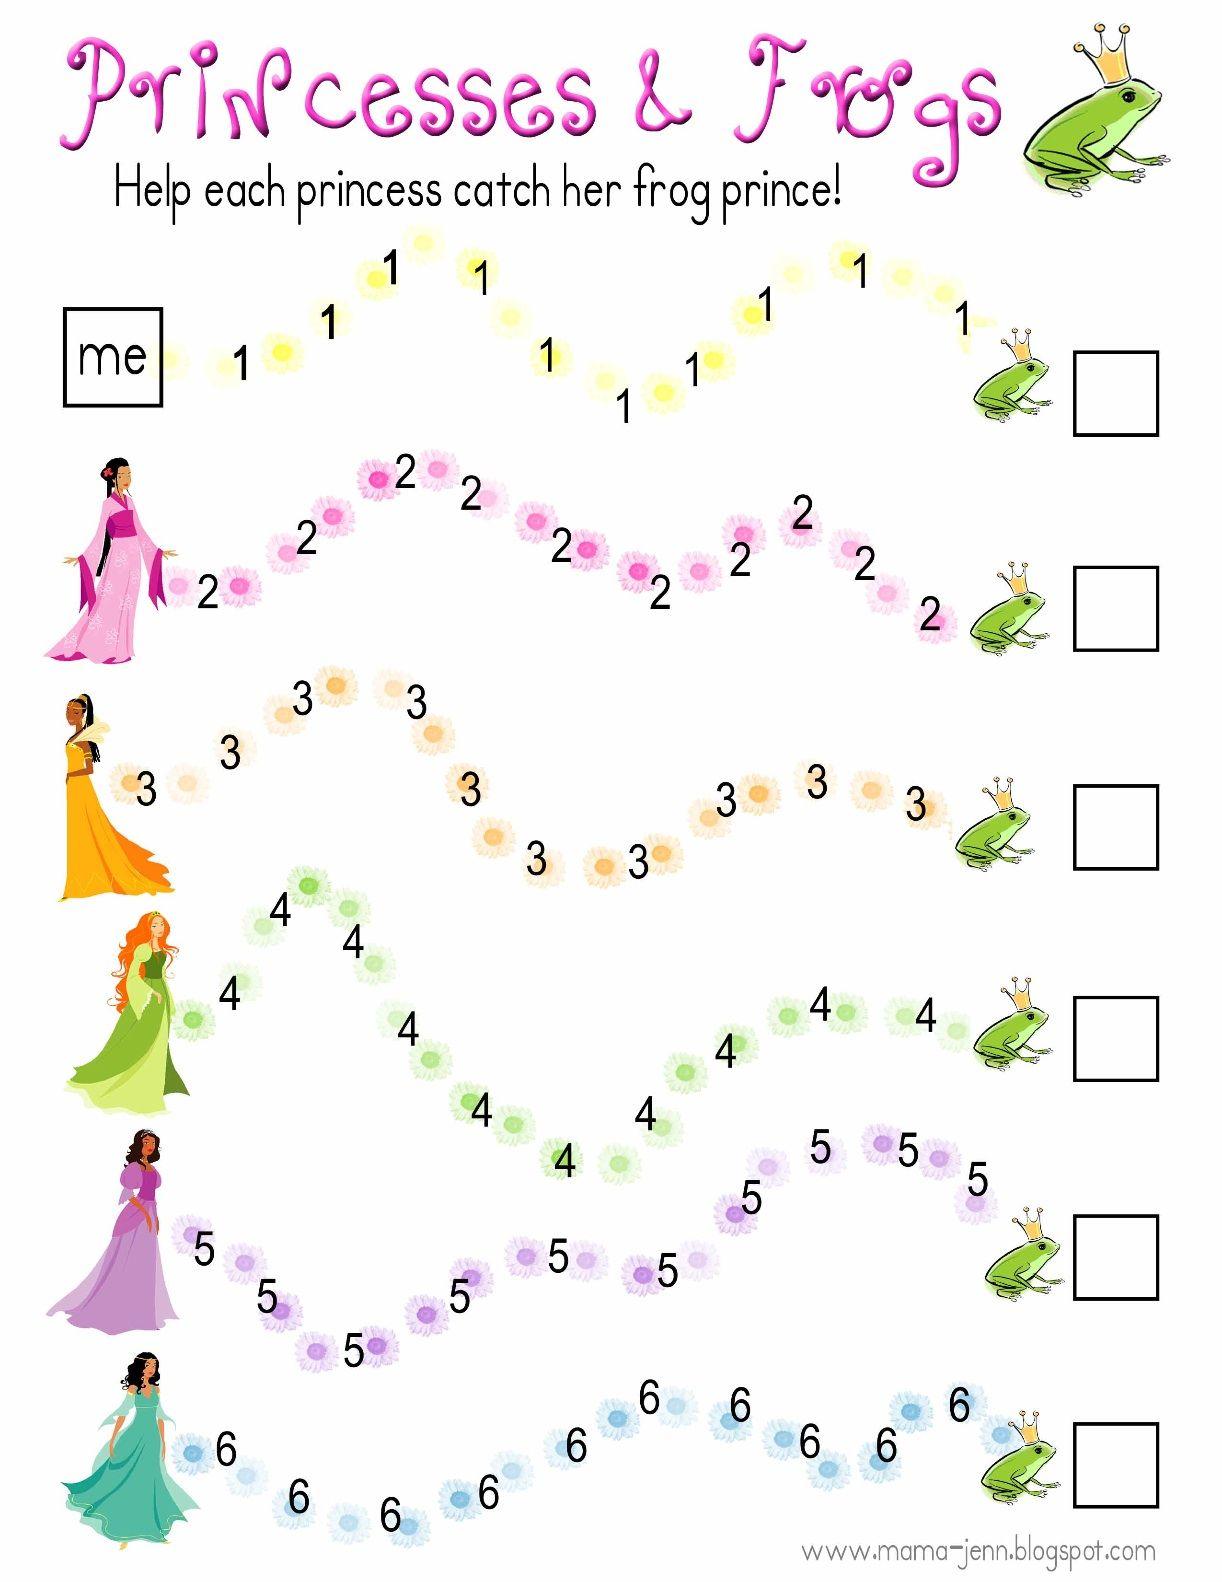 Princesses Amp Frogs